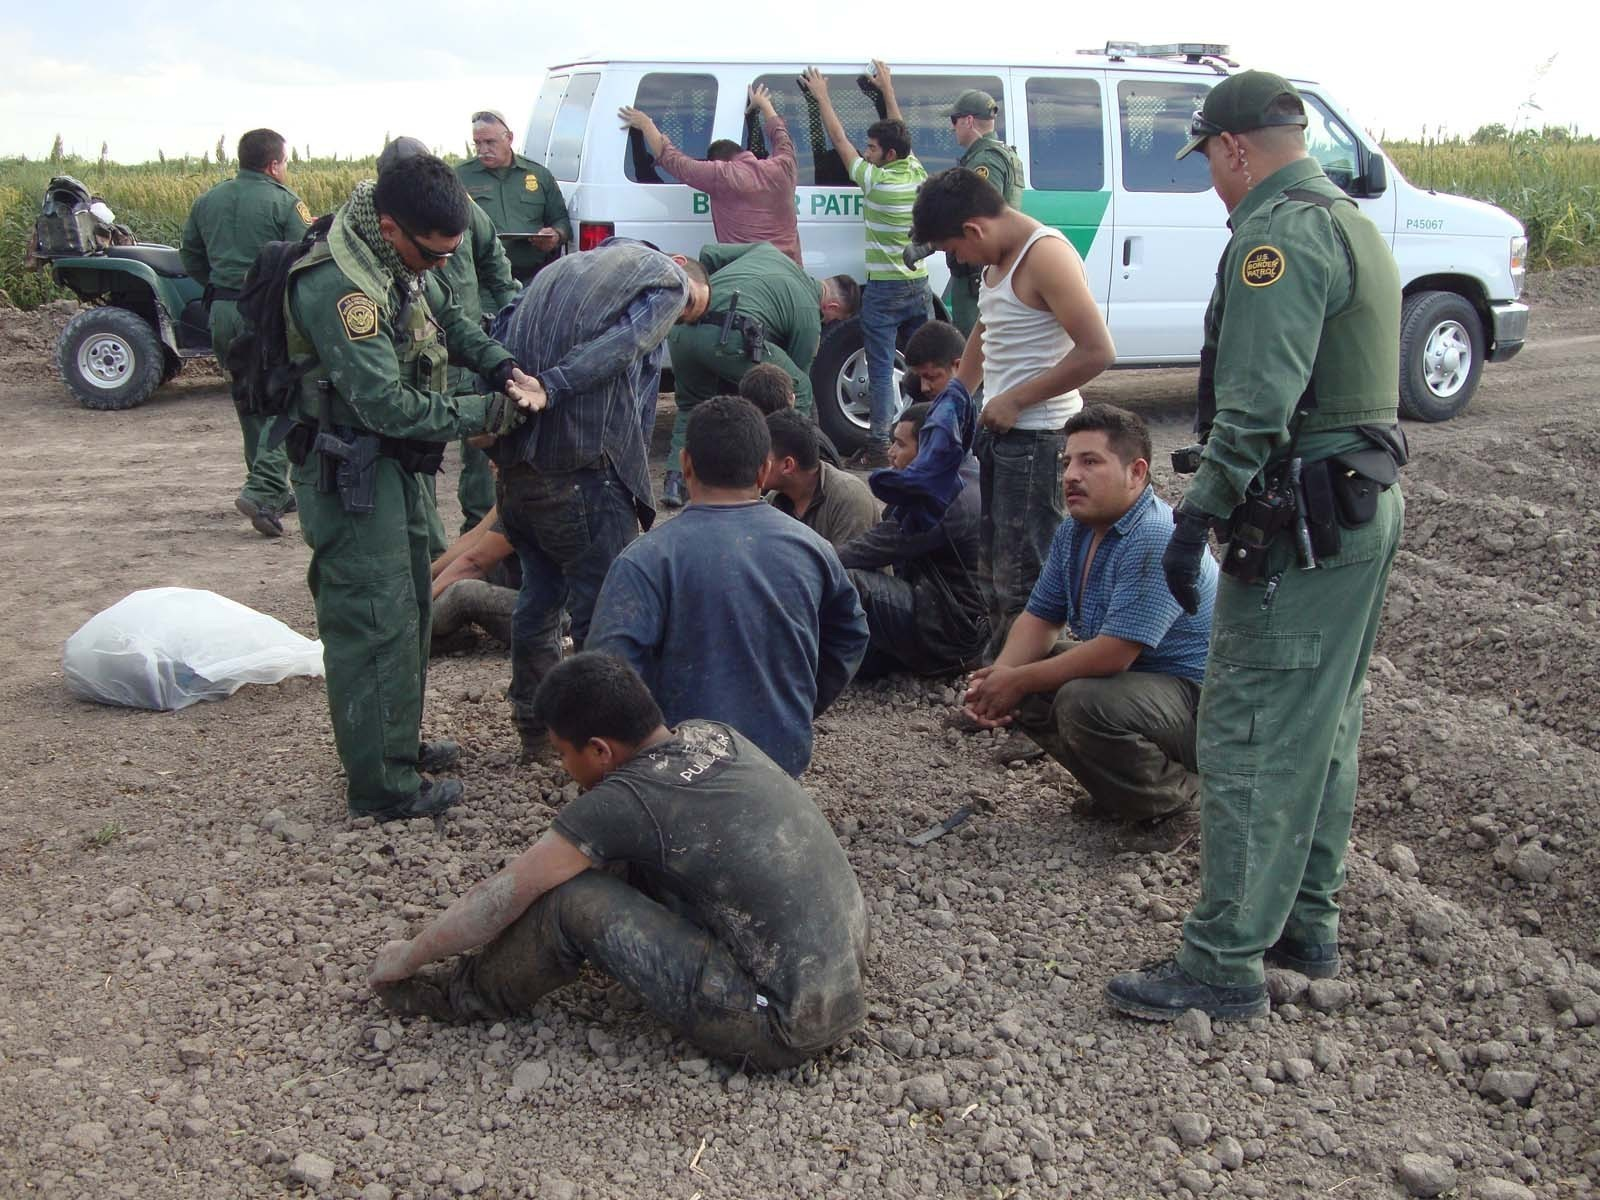 Border Patrol Agent Shoots At Armed Militia Member In